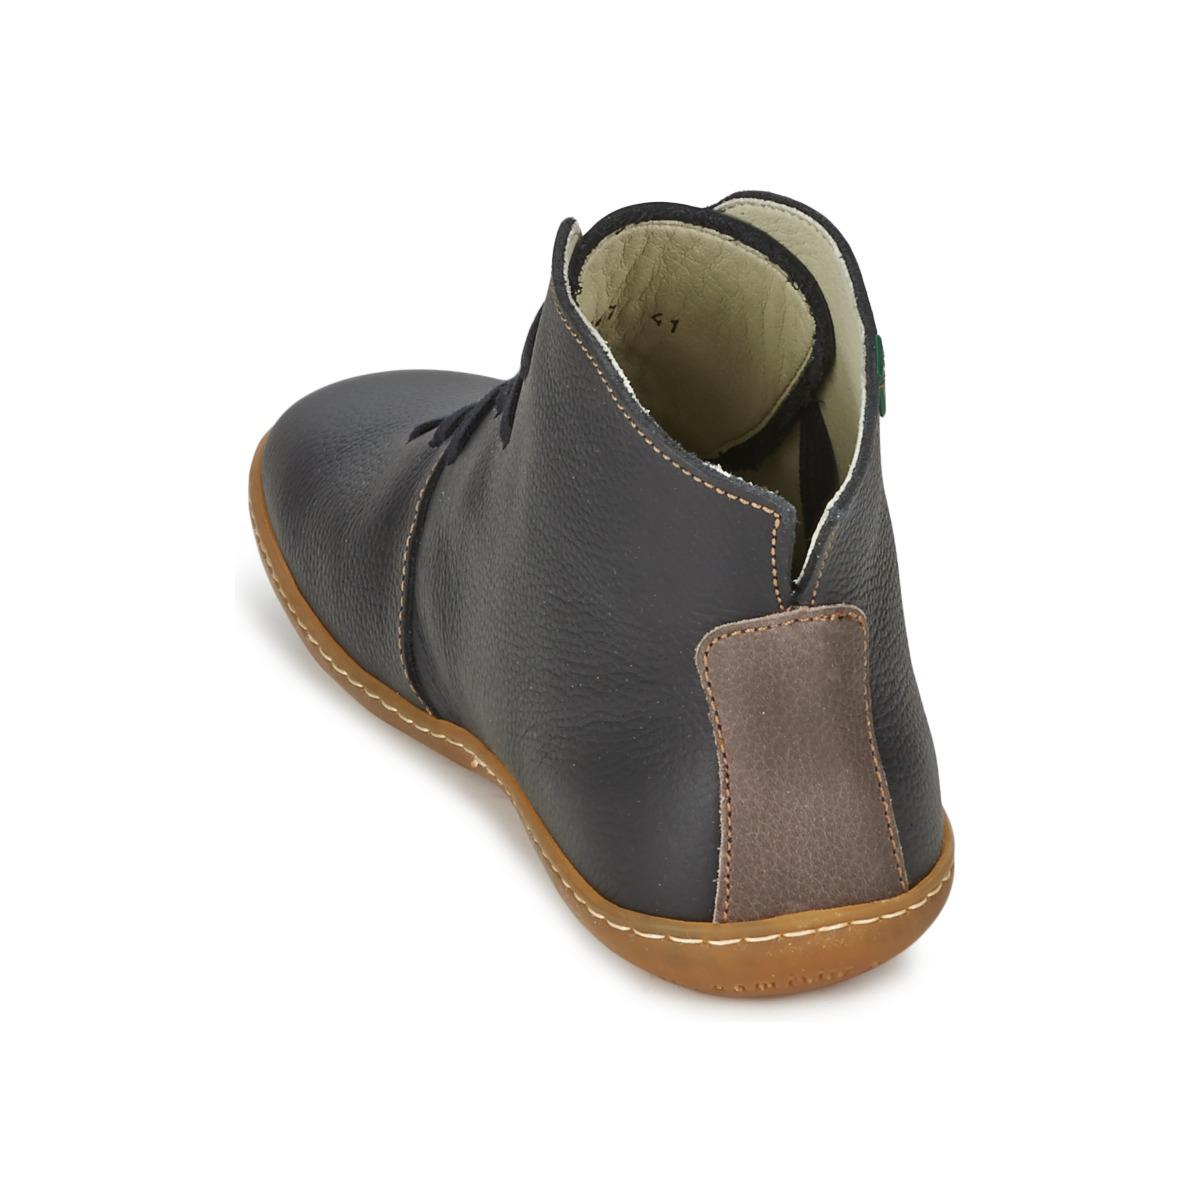 El Naturalista Leather El Viajero Women's Mid Boots In Black